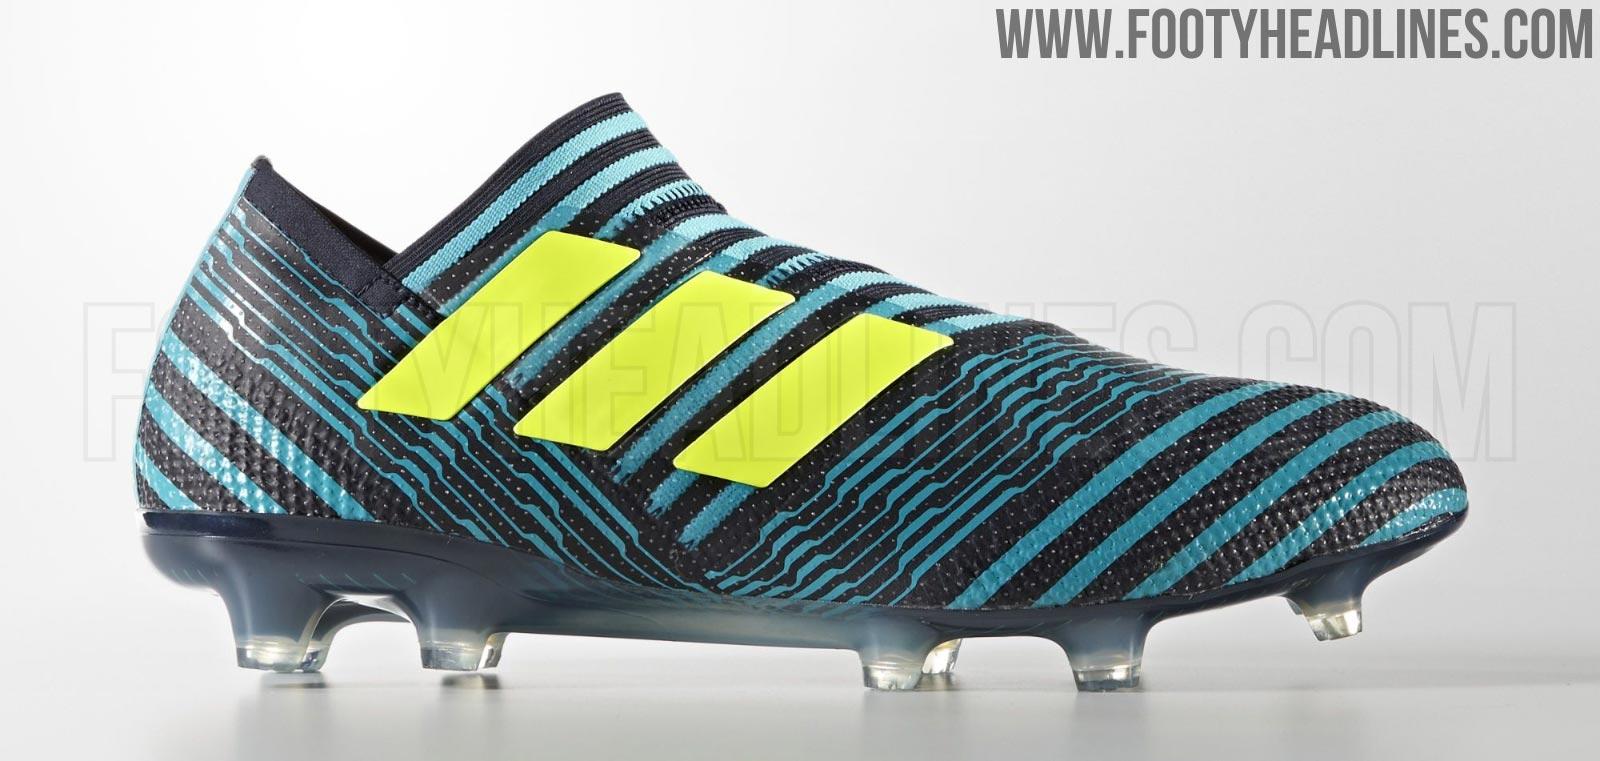 Cheap Adidas Soccer adidas Nemeziz 17+ 360 Agility FG Ocean Storm